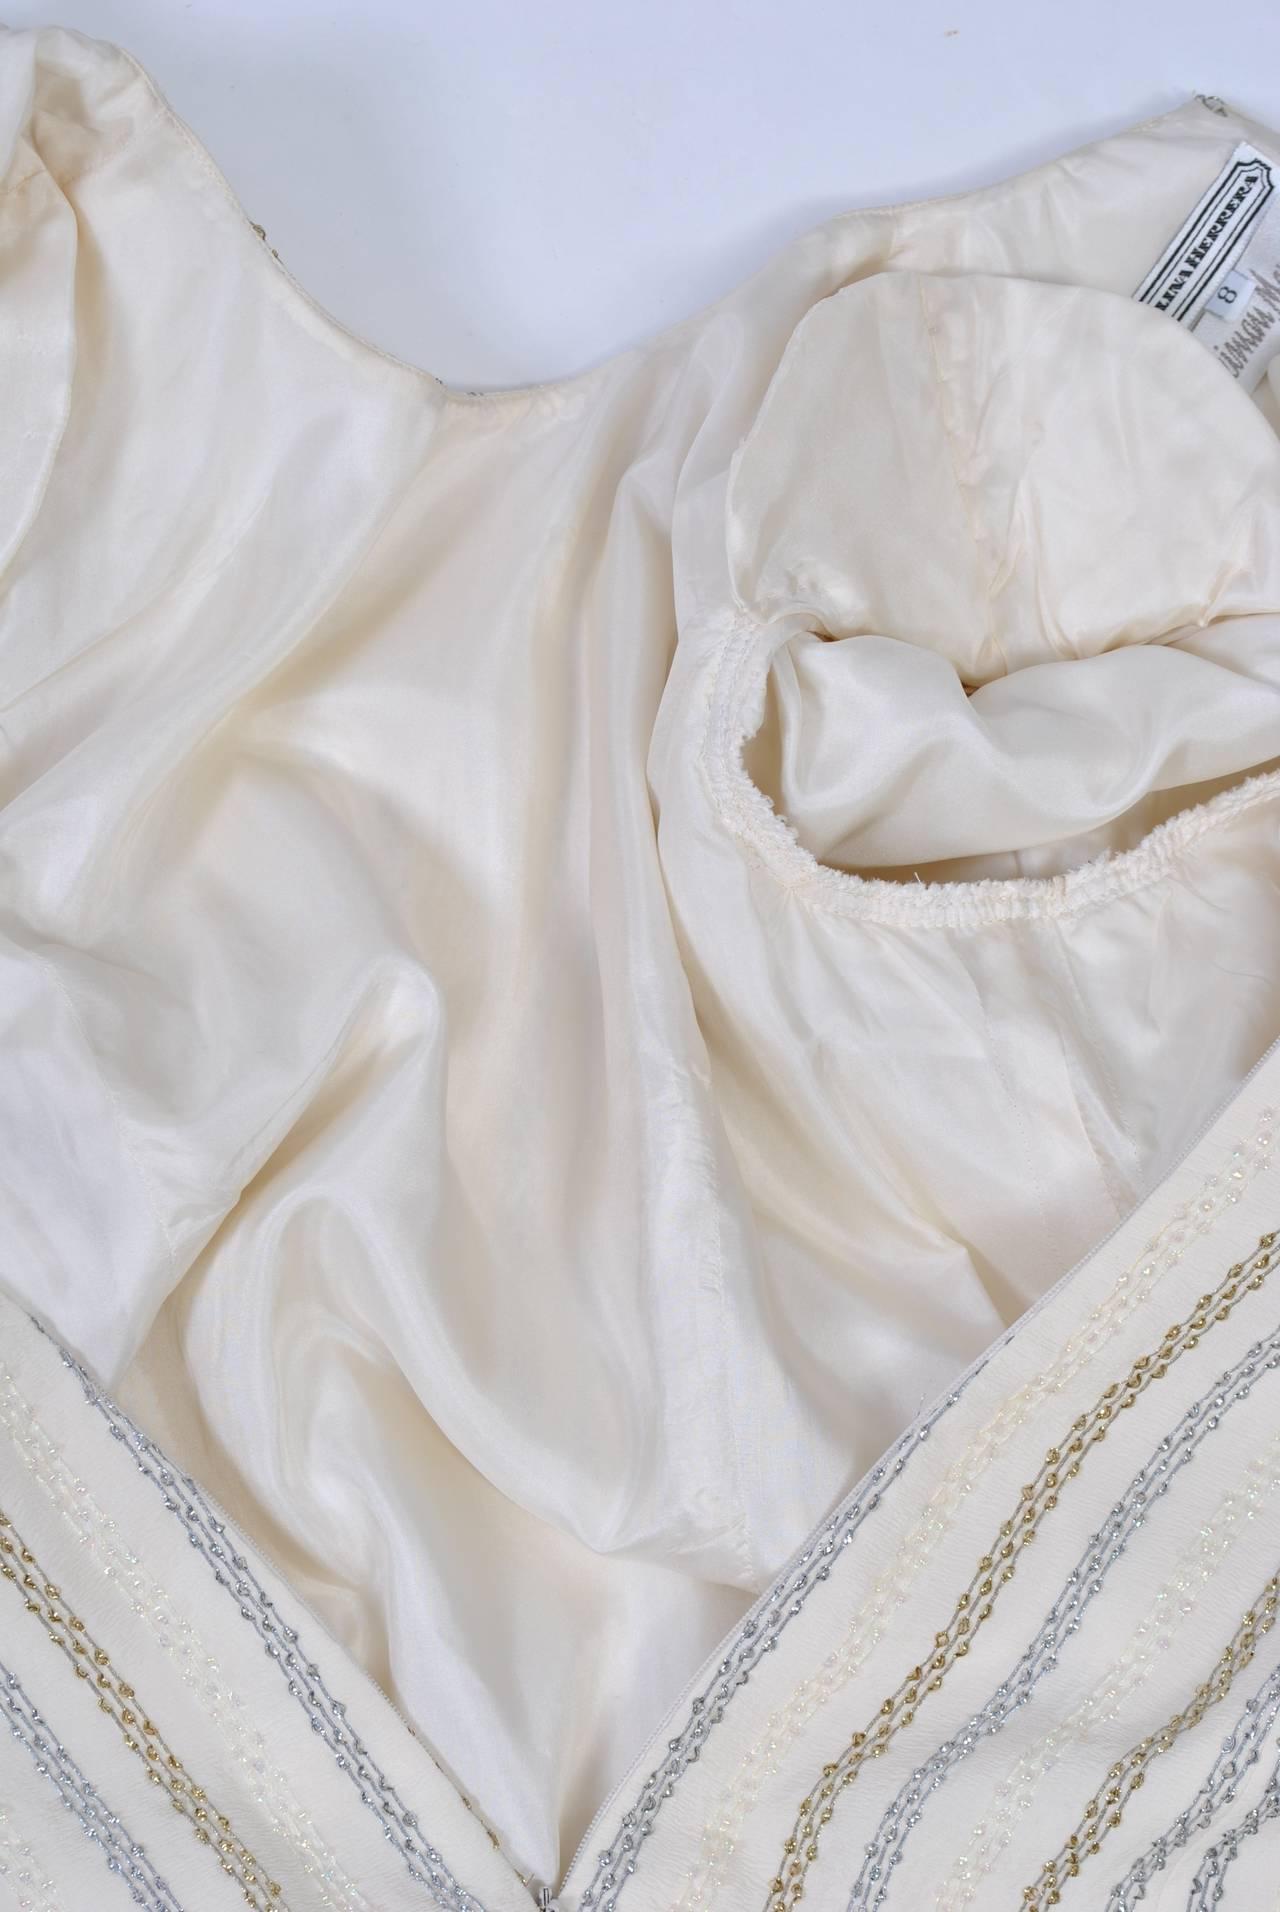 Carolina Herrera Ivory and Metallic Dress 2